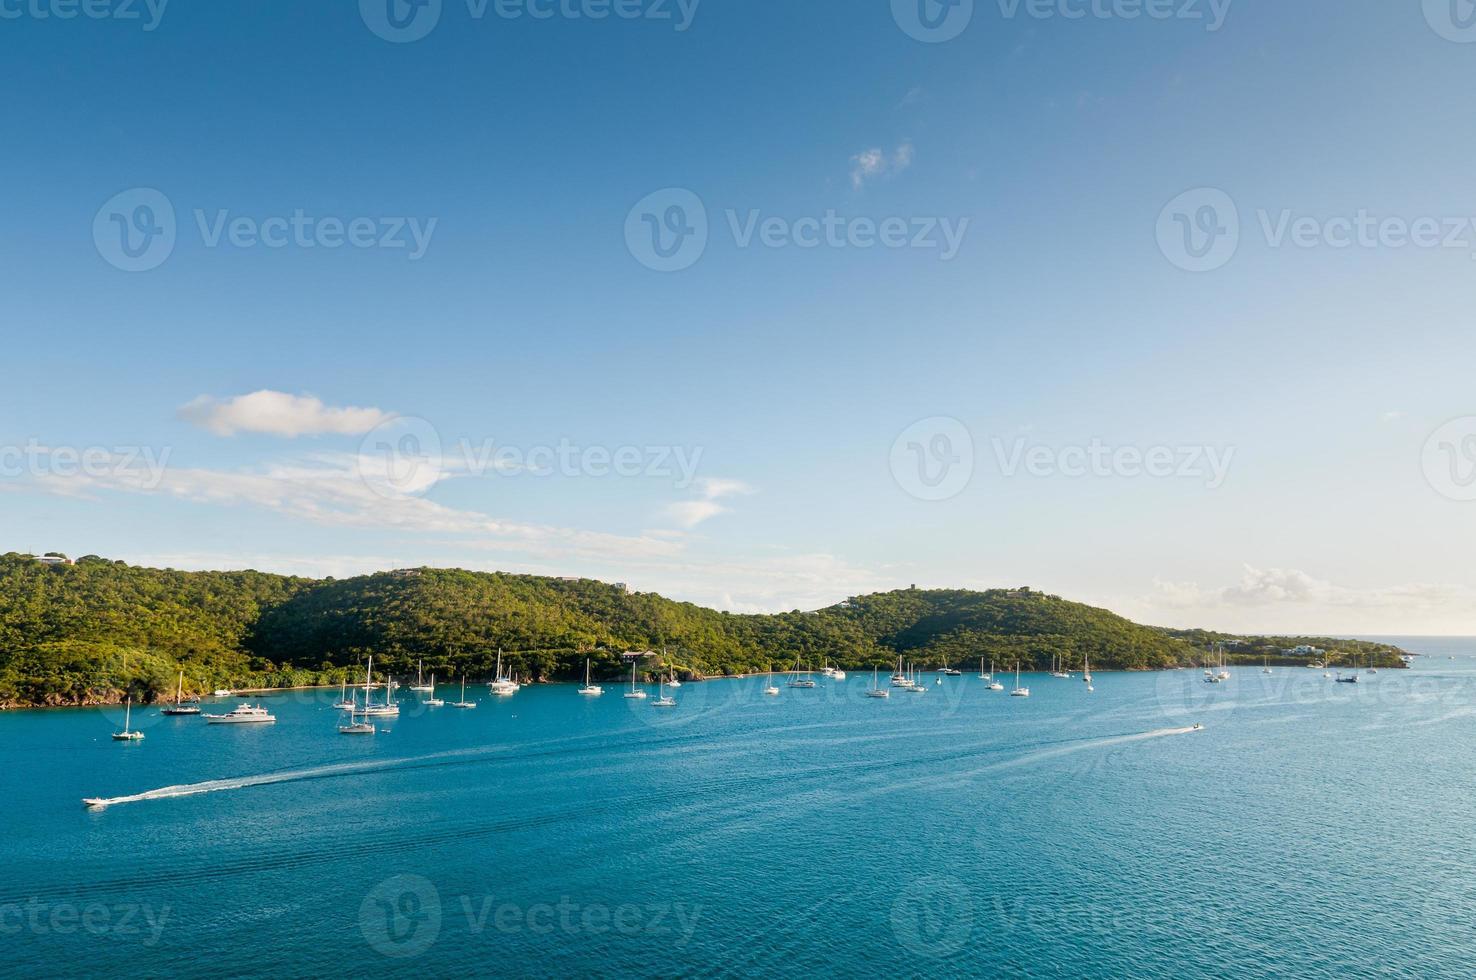 Sailboats in the Caribbean photo